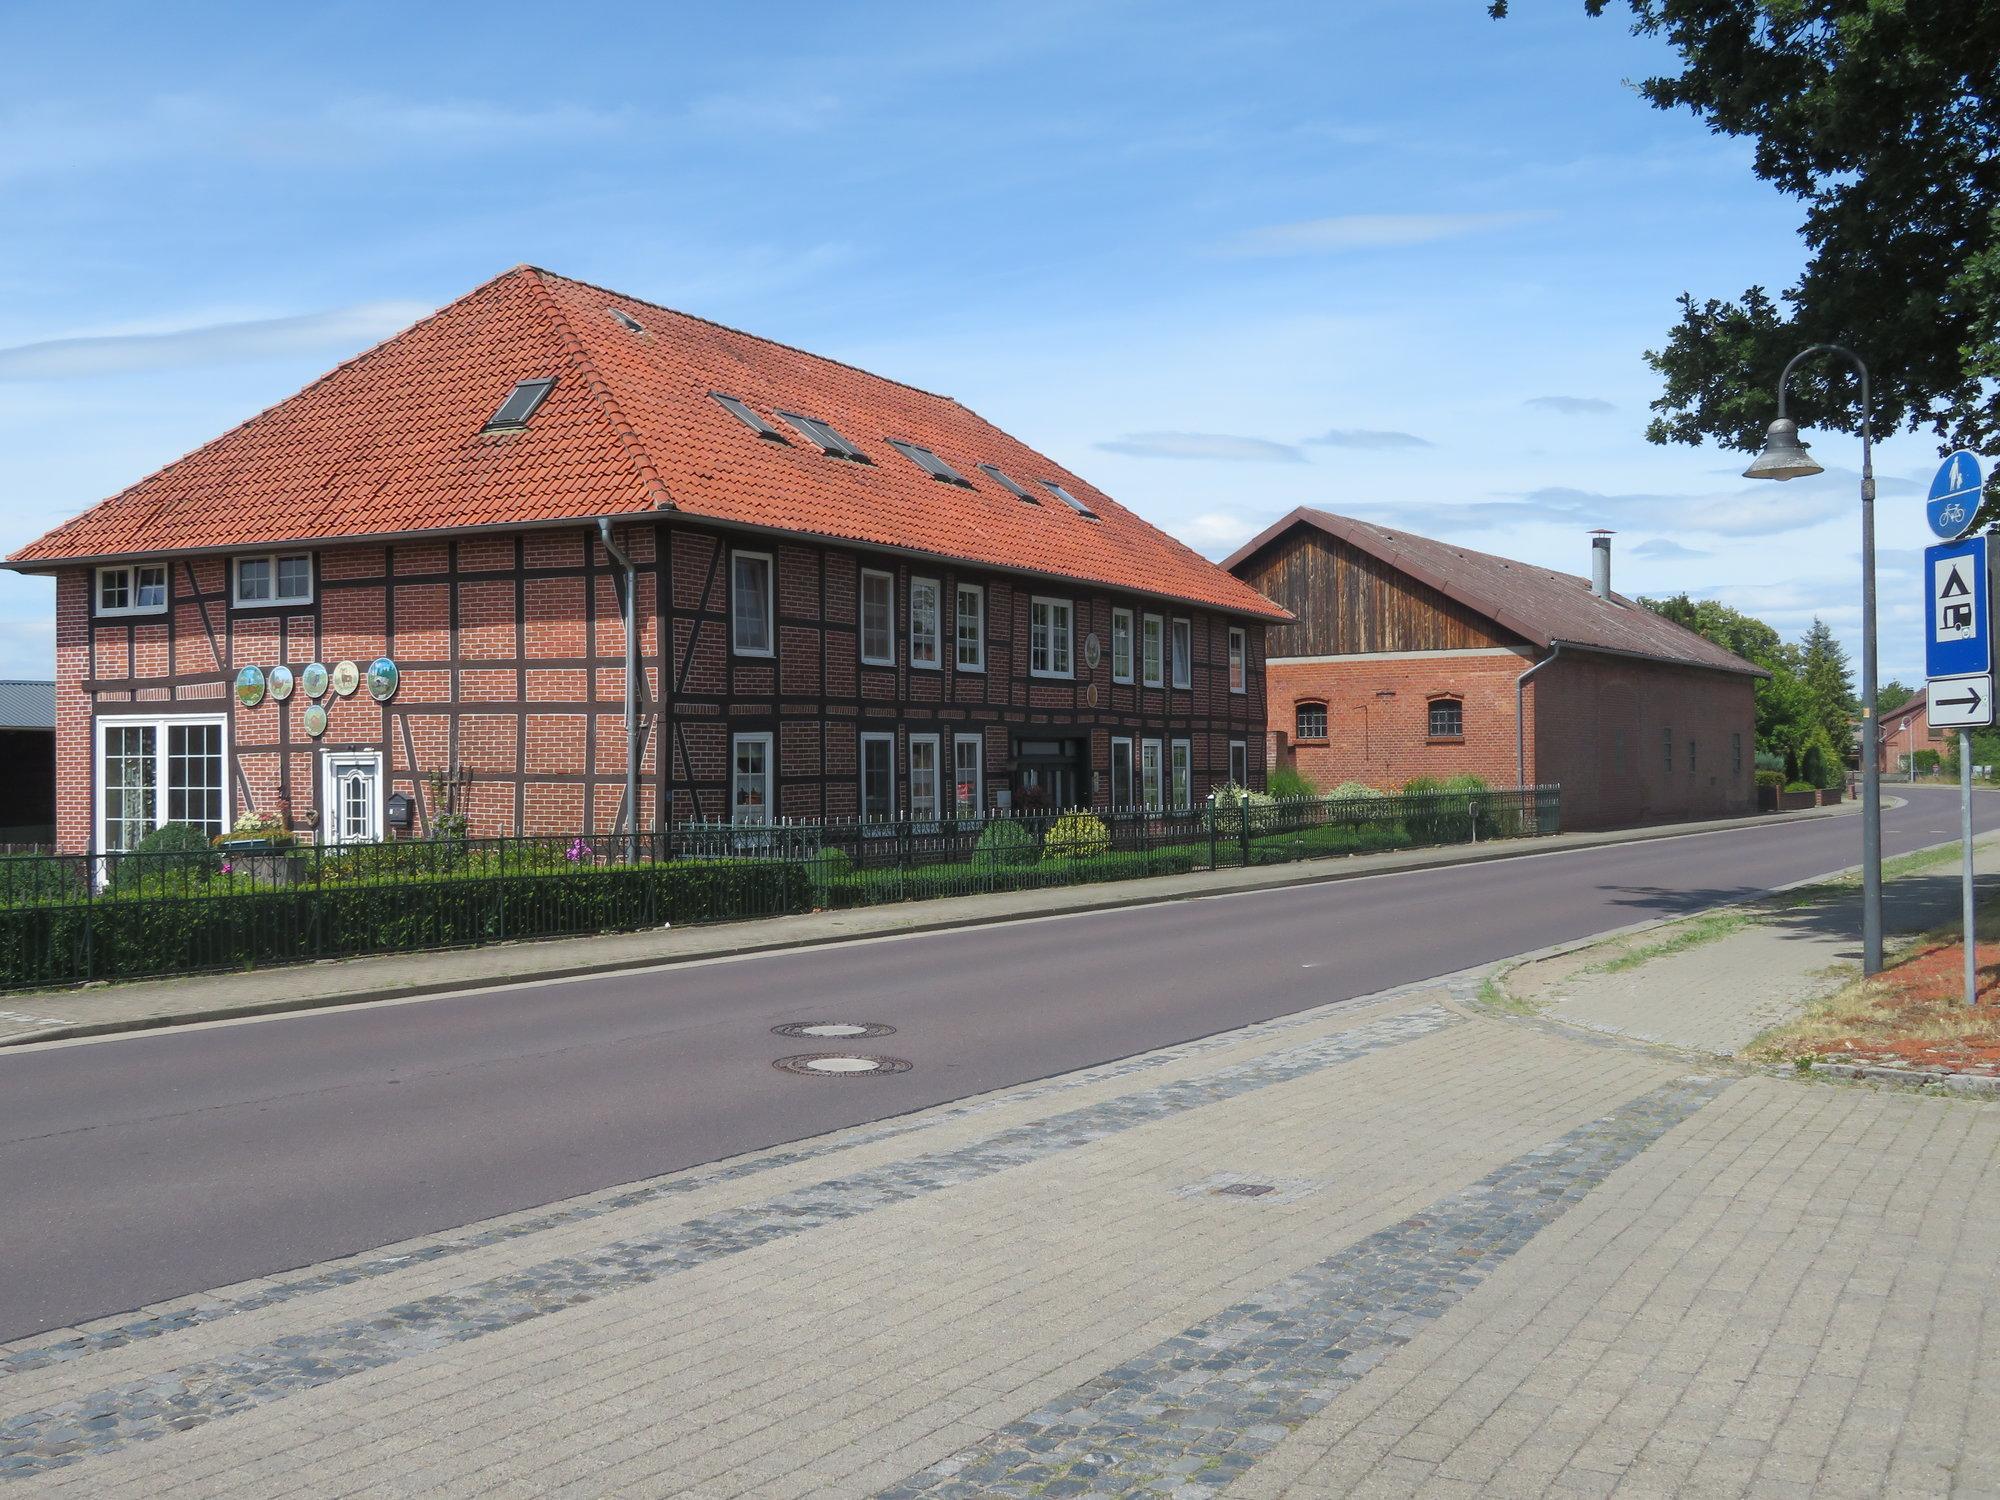 2019-07-04 Houses near Wolfsburg, Germany 1.JPG